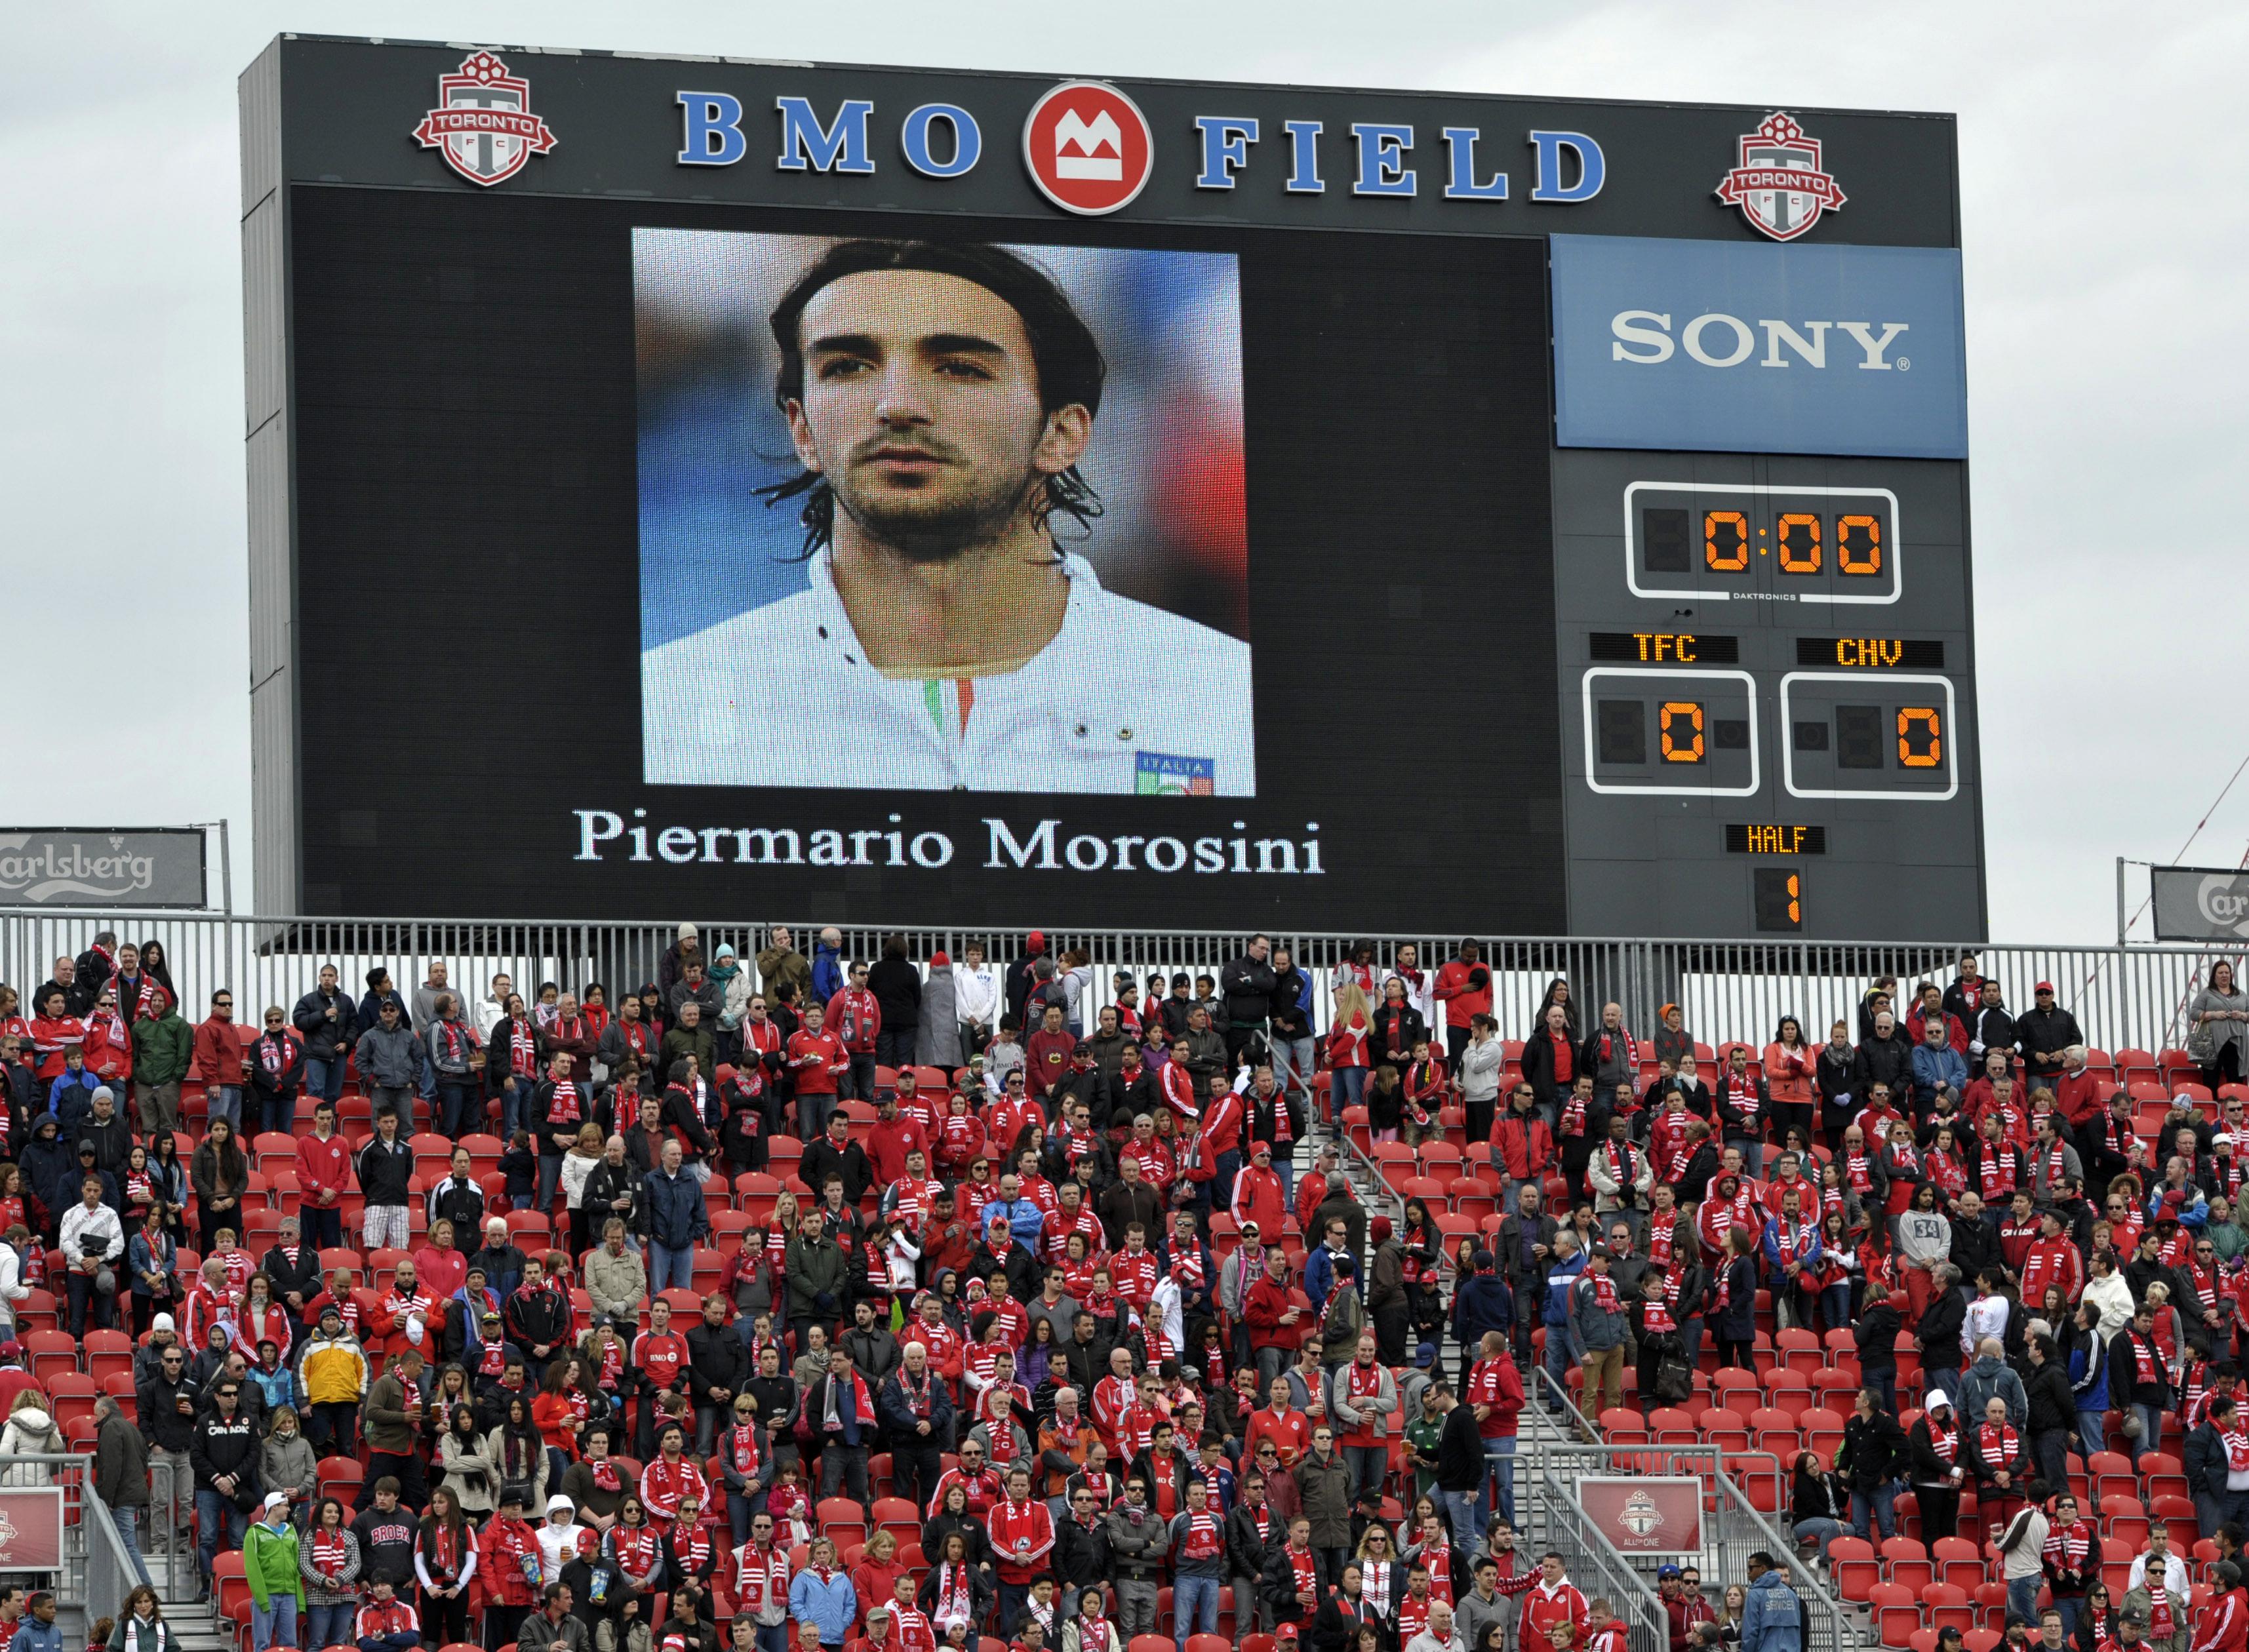 Ils fans da Livorno commemoreschan Piermario Morosini.